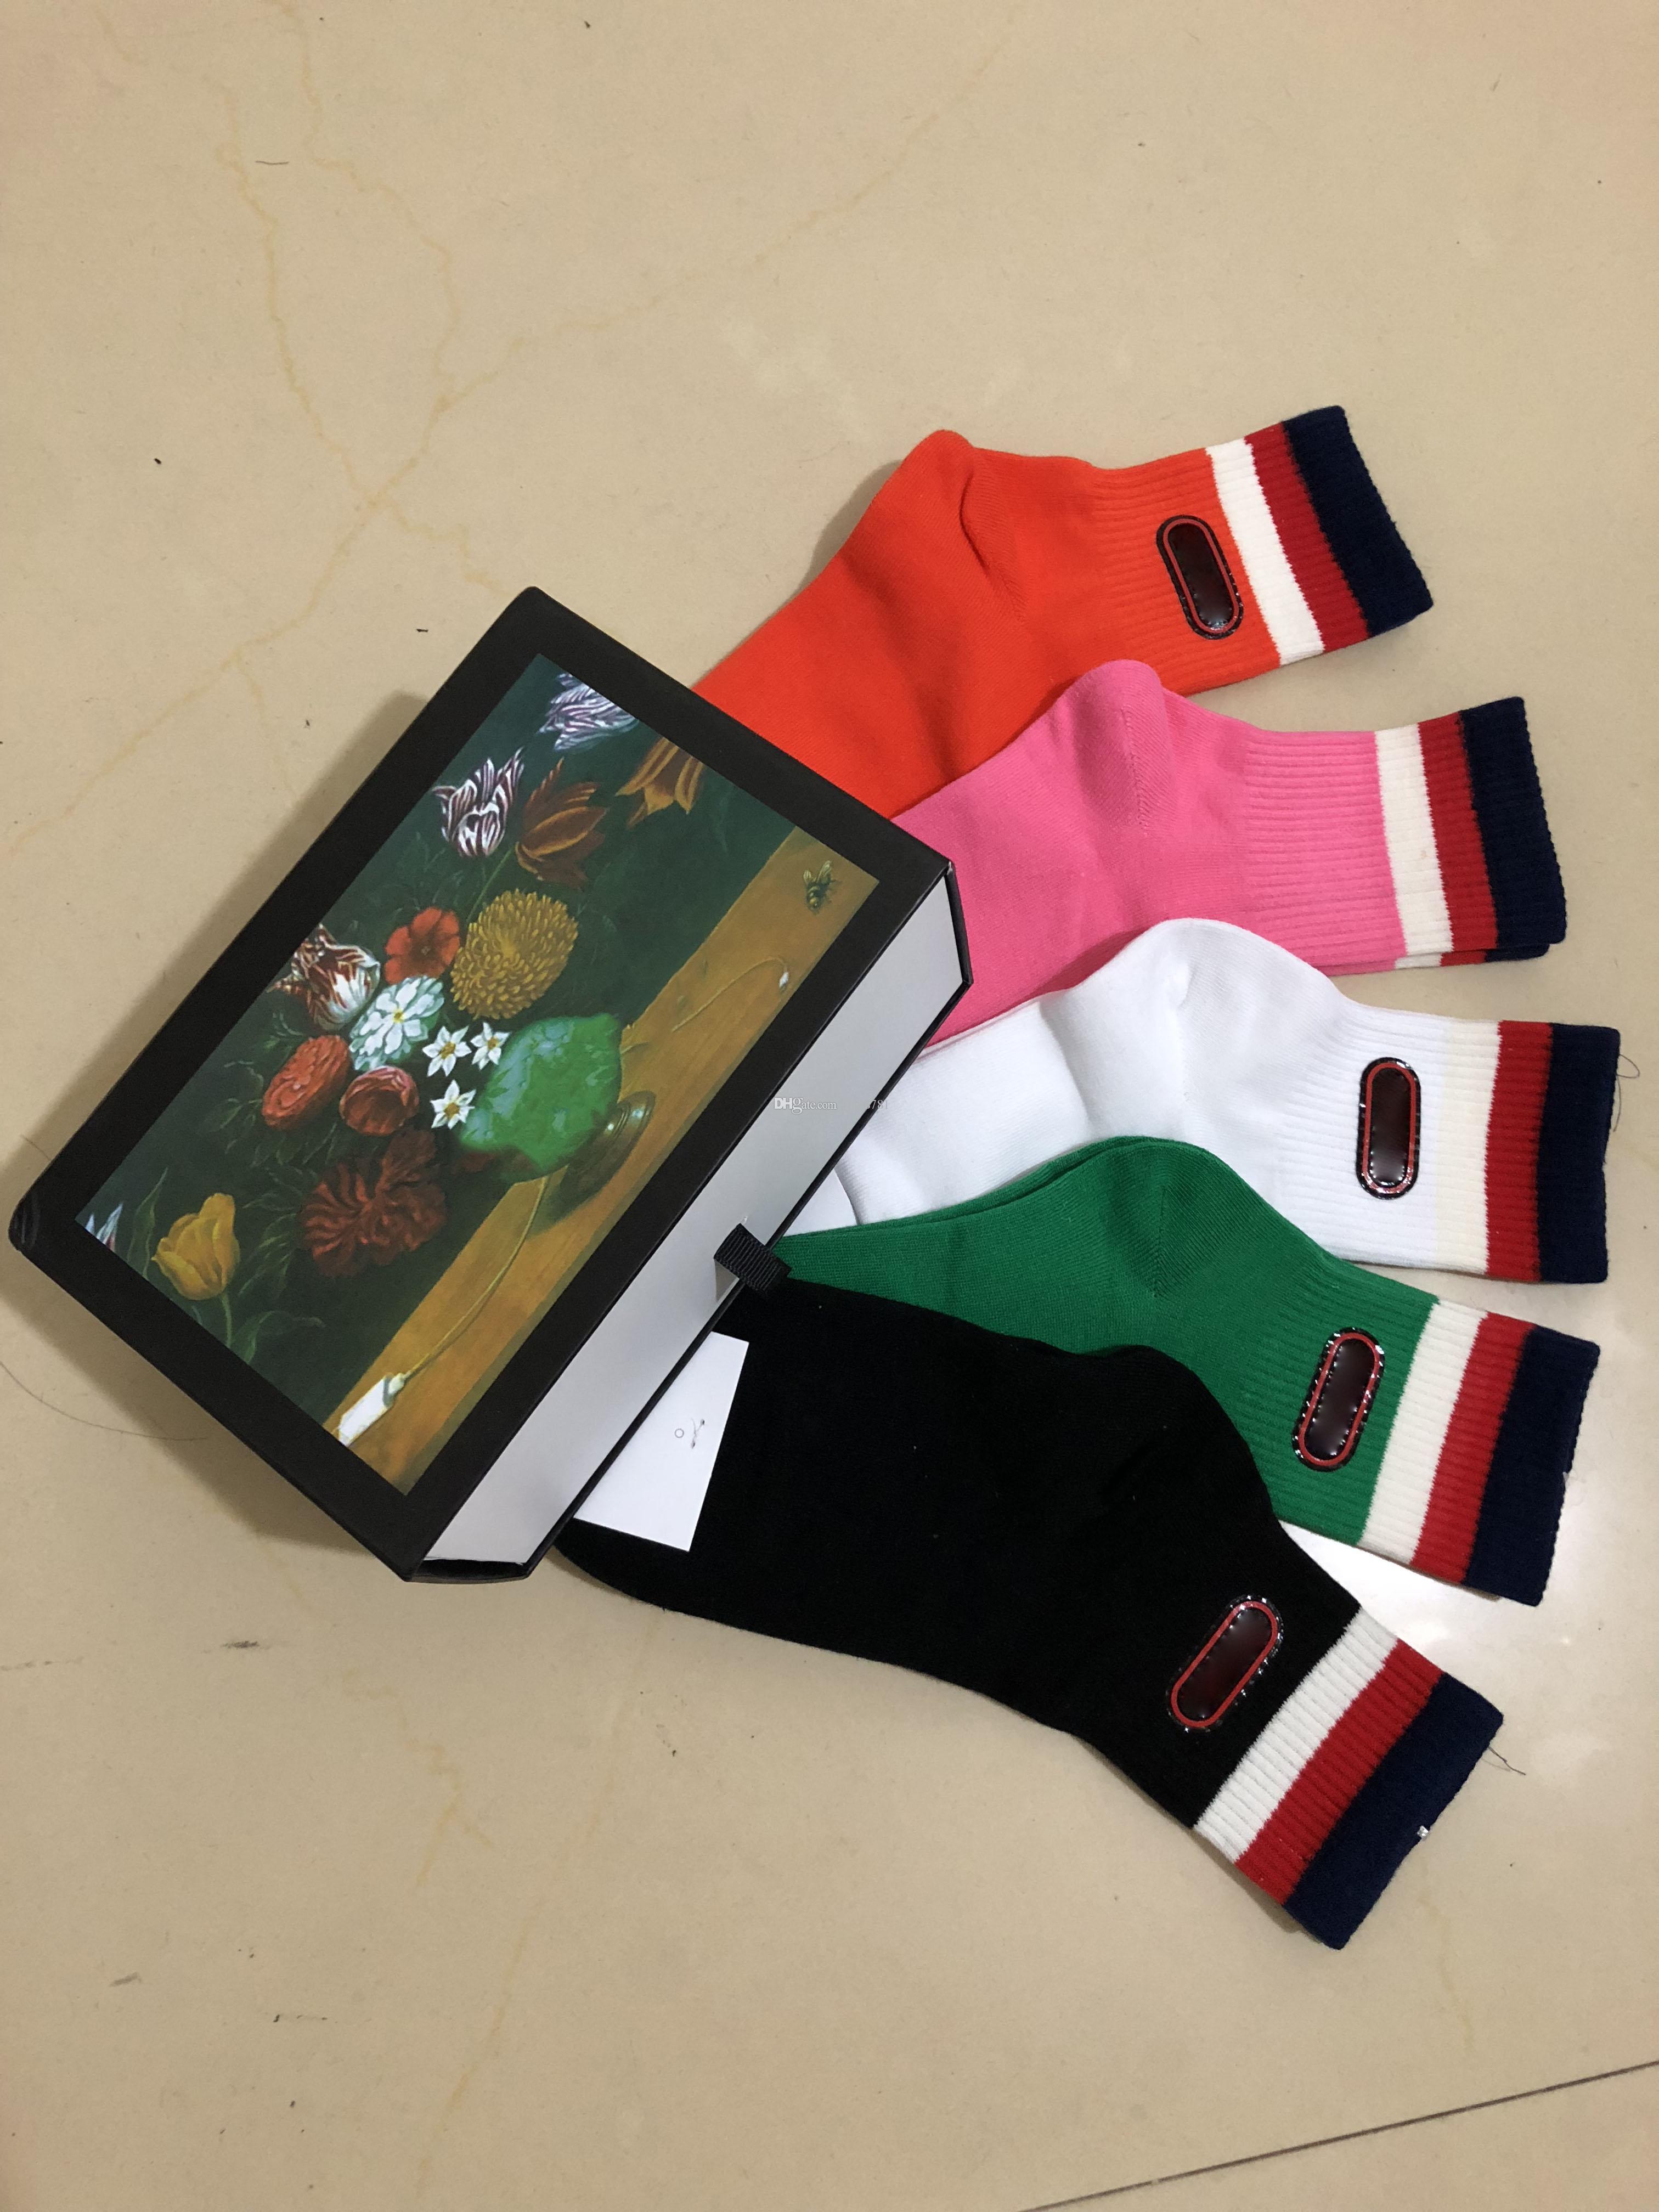 New 5 pairs ace Socks Antibacterial Deodorant designer brand Cotton Fashion Unisex brand Socks Sport 5 color pink luxury designer socks